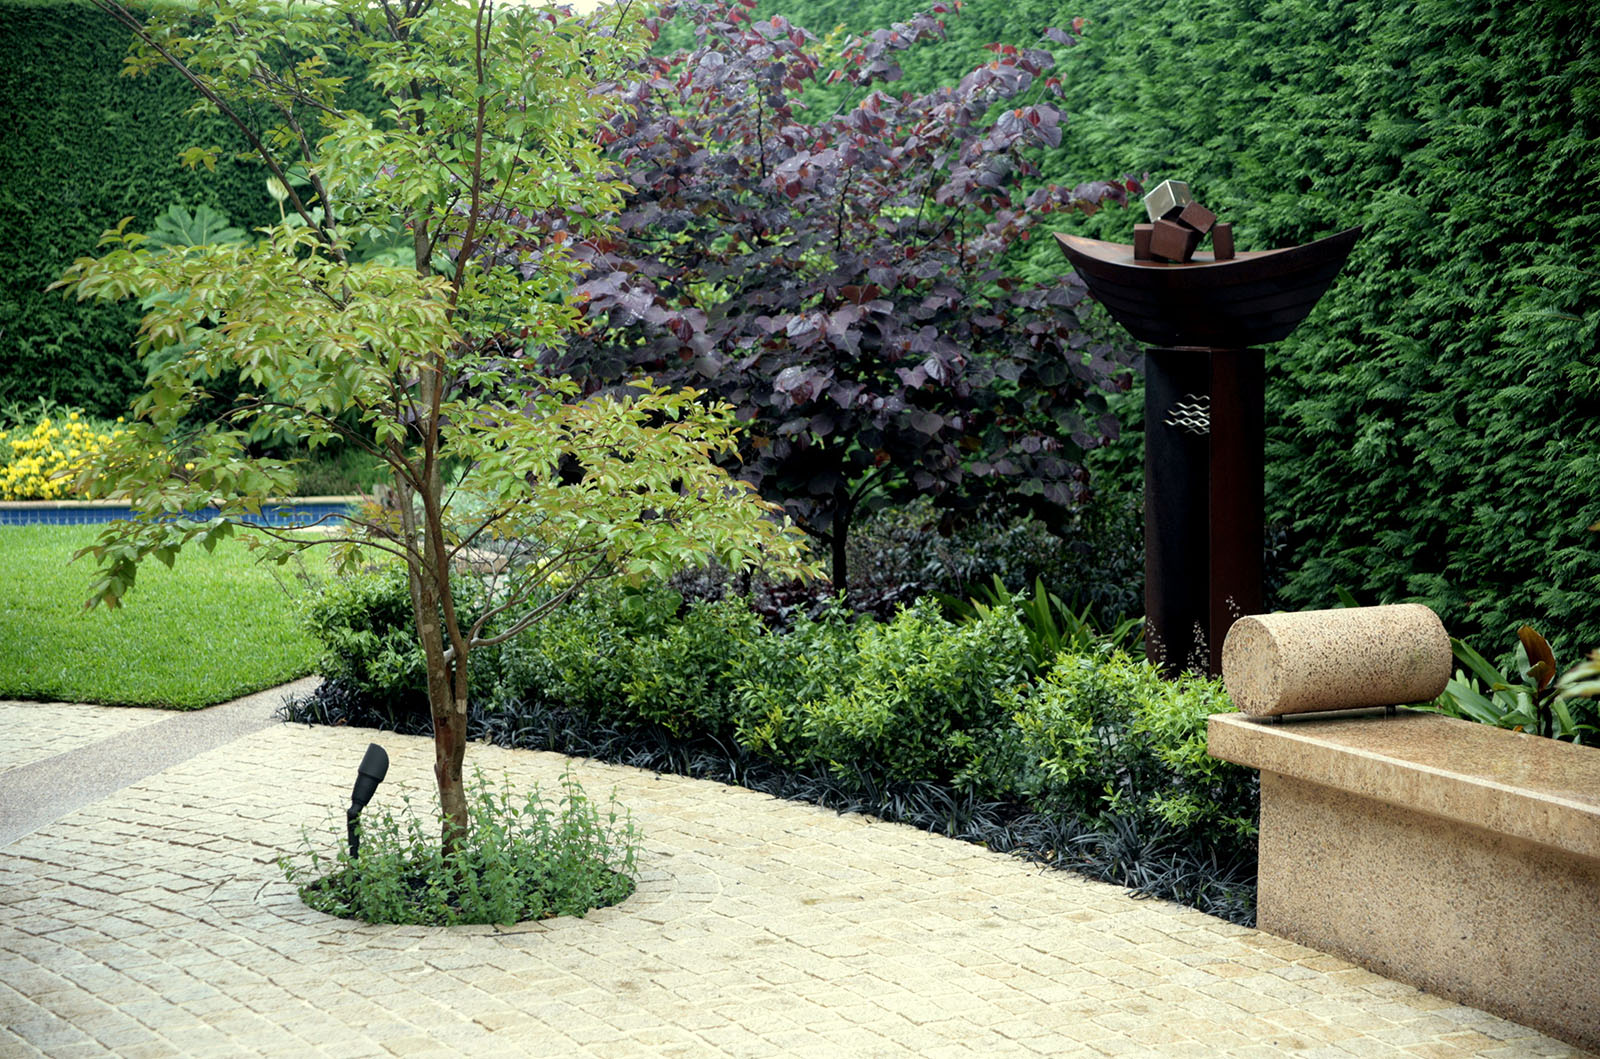 Sculptured Garden_0005s_0012_Hughes 1